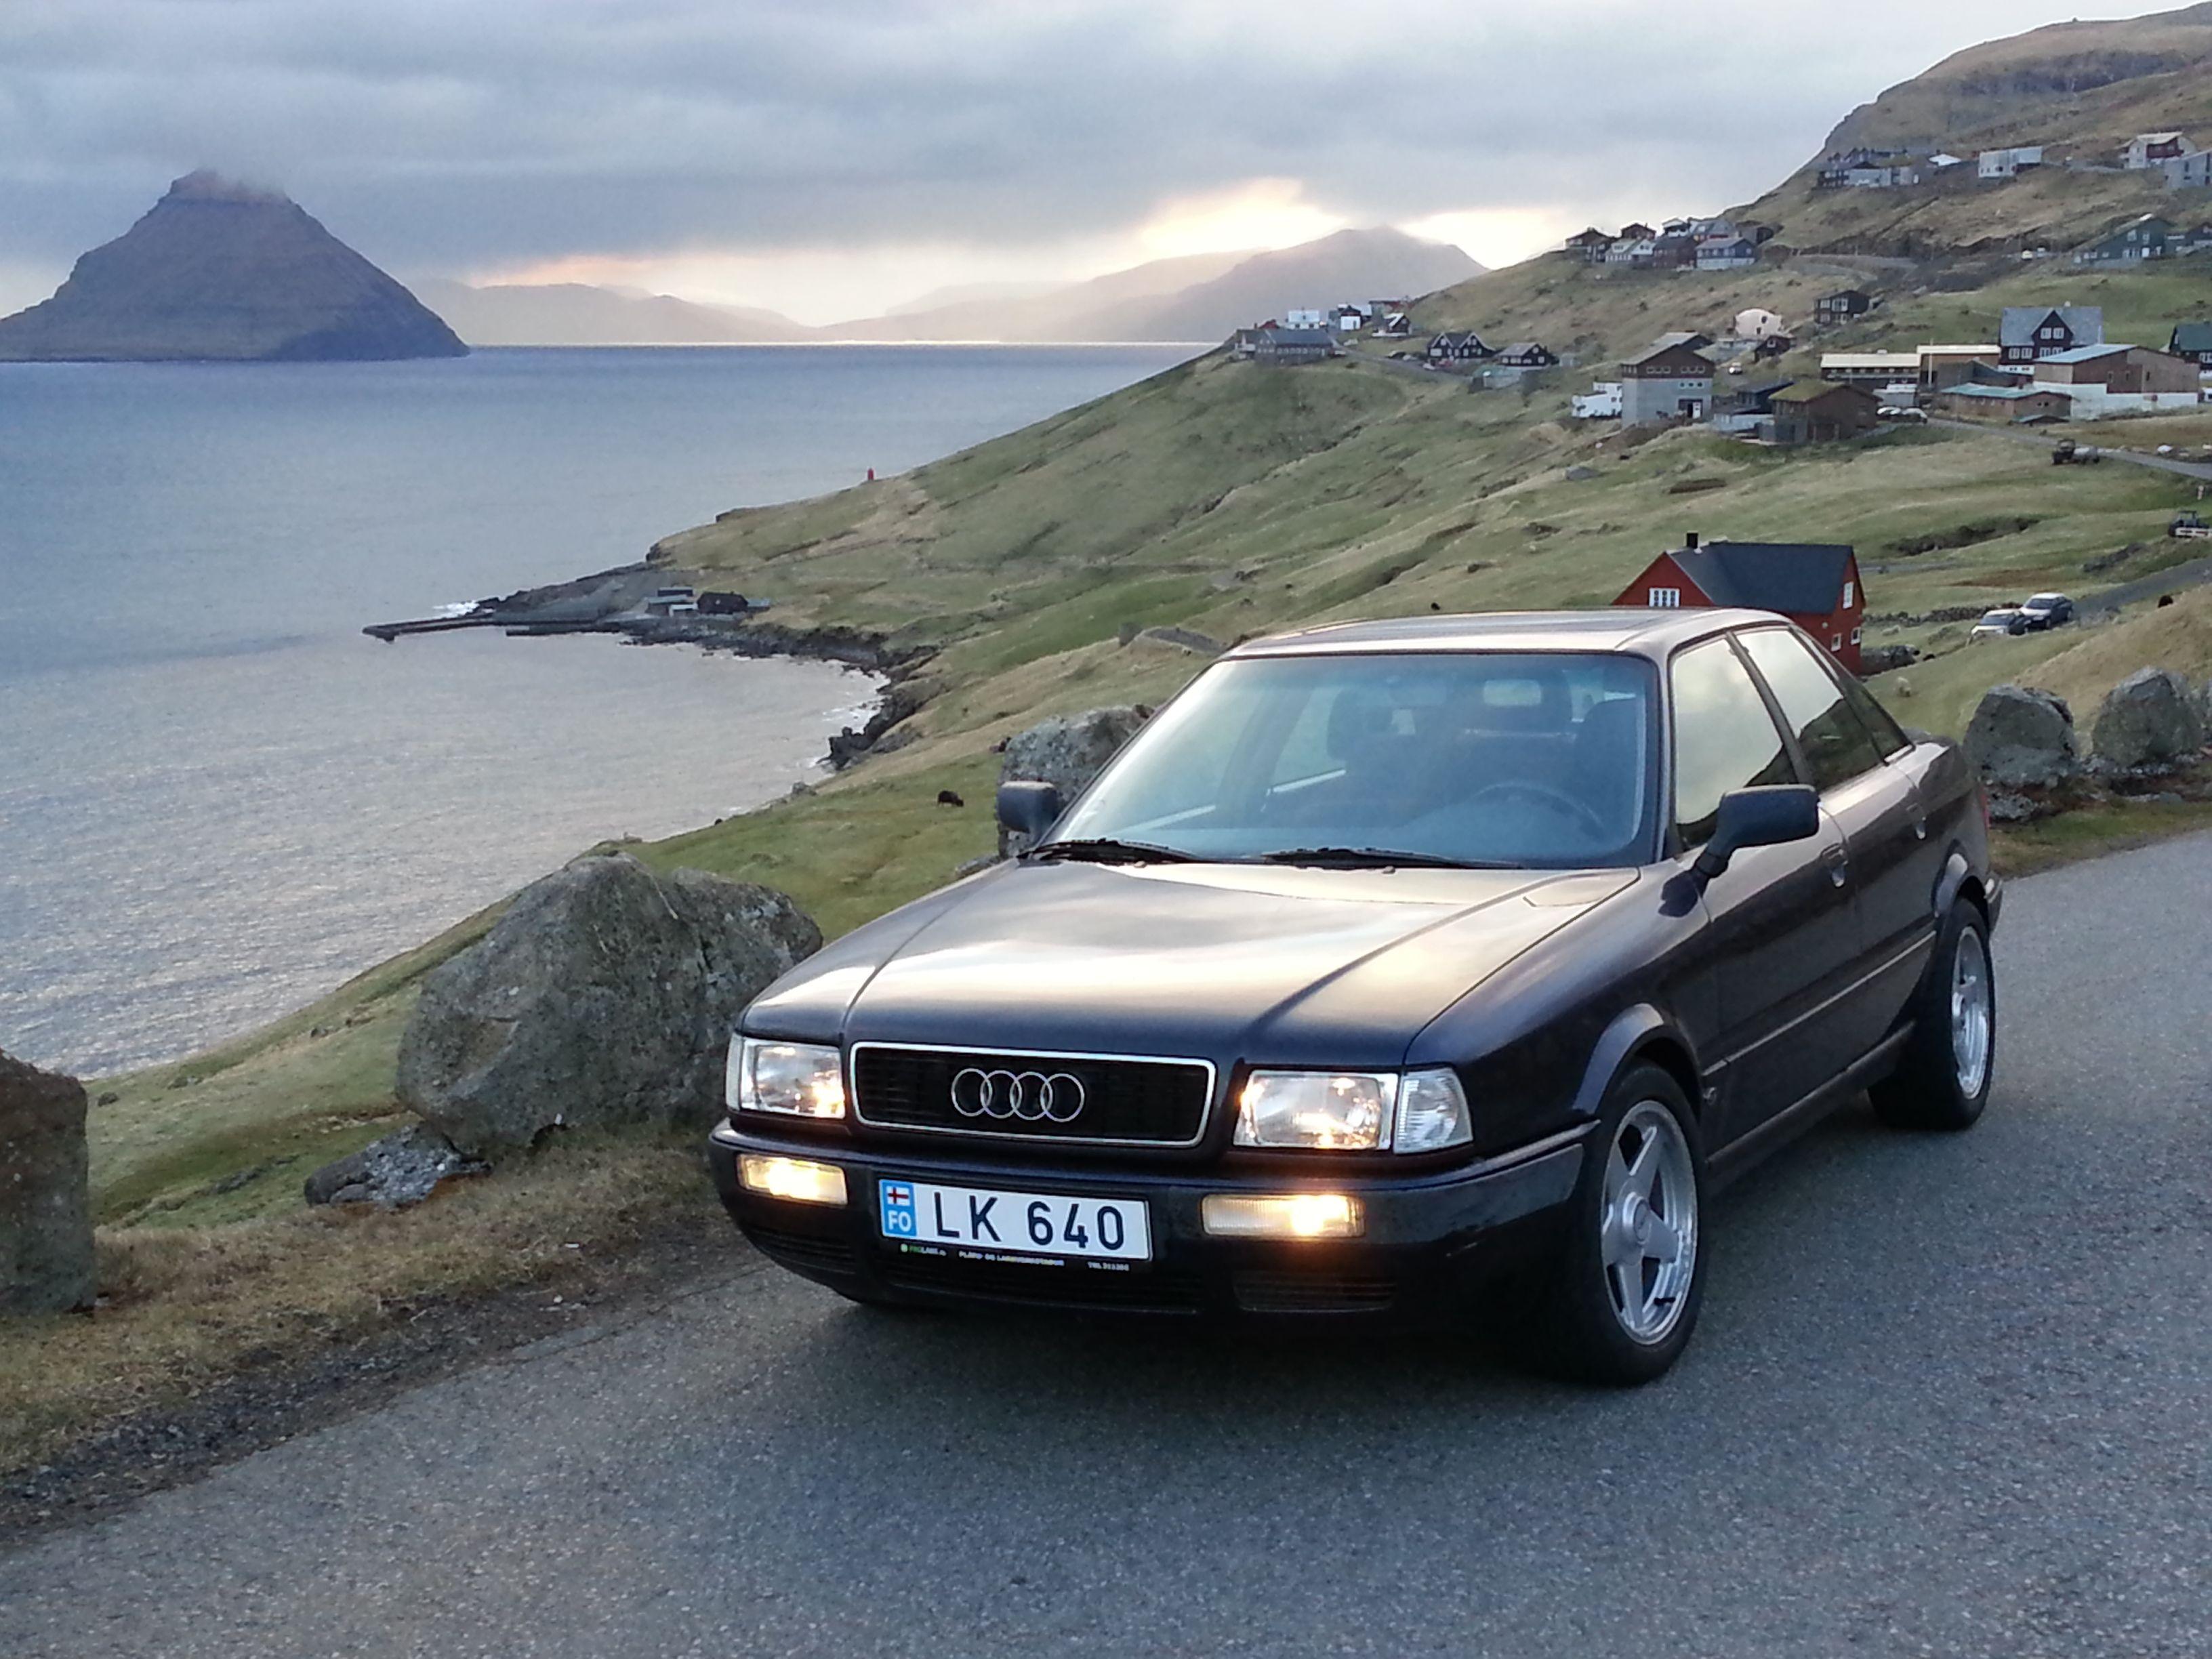 Audi 80 1 9 Tdi 1993 Audi Tdi Audi A4